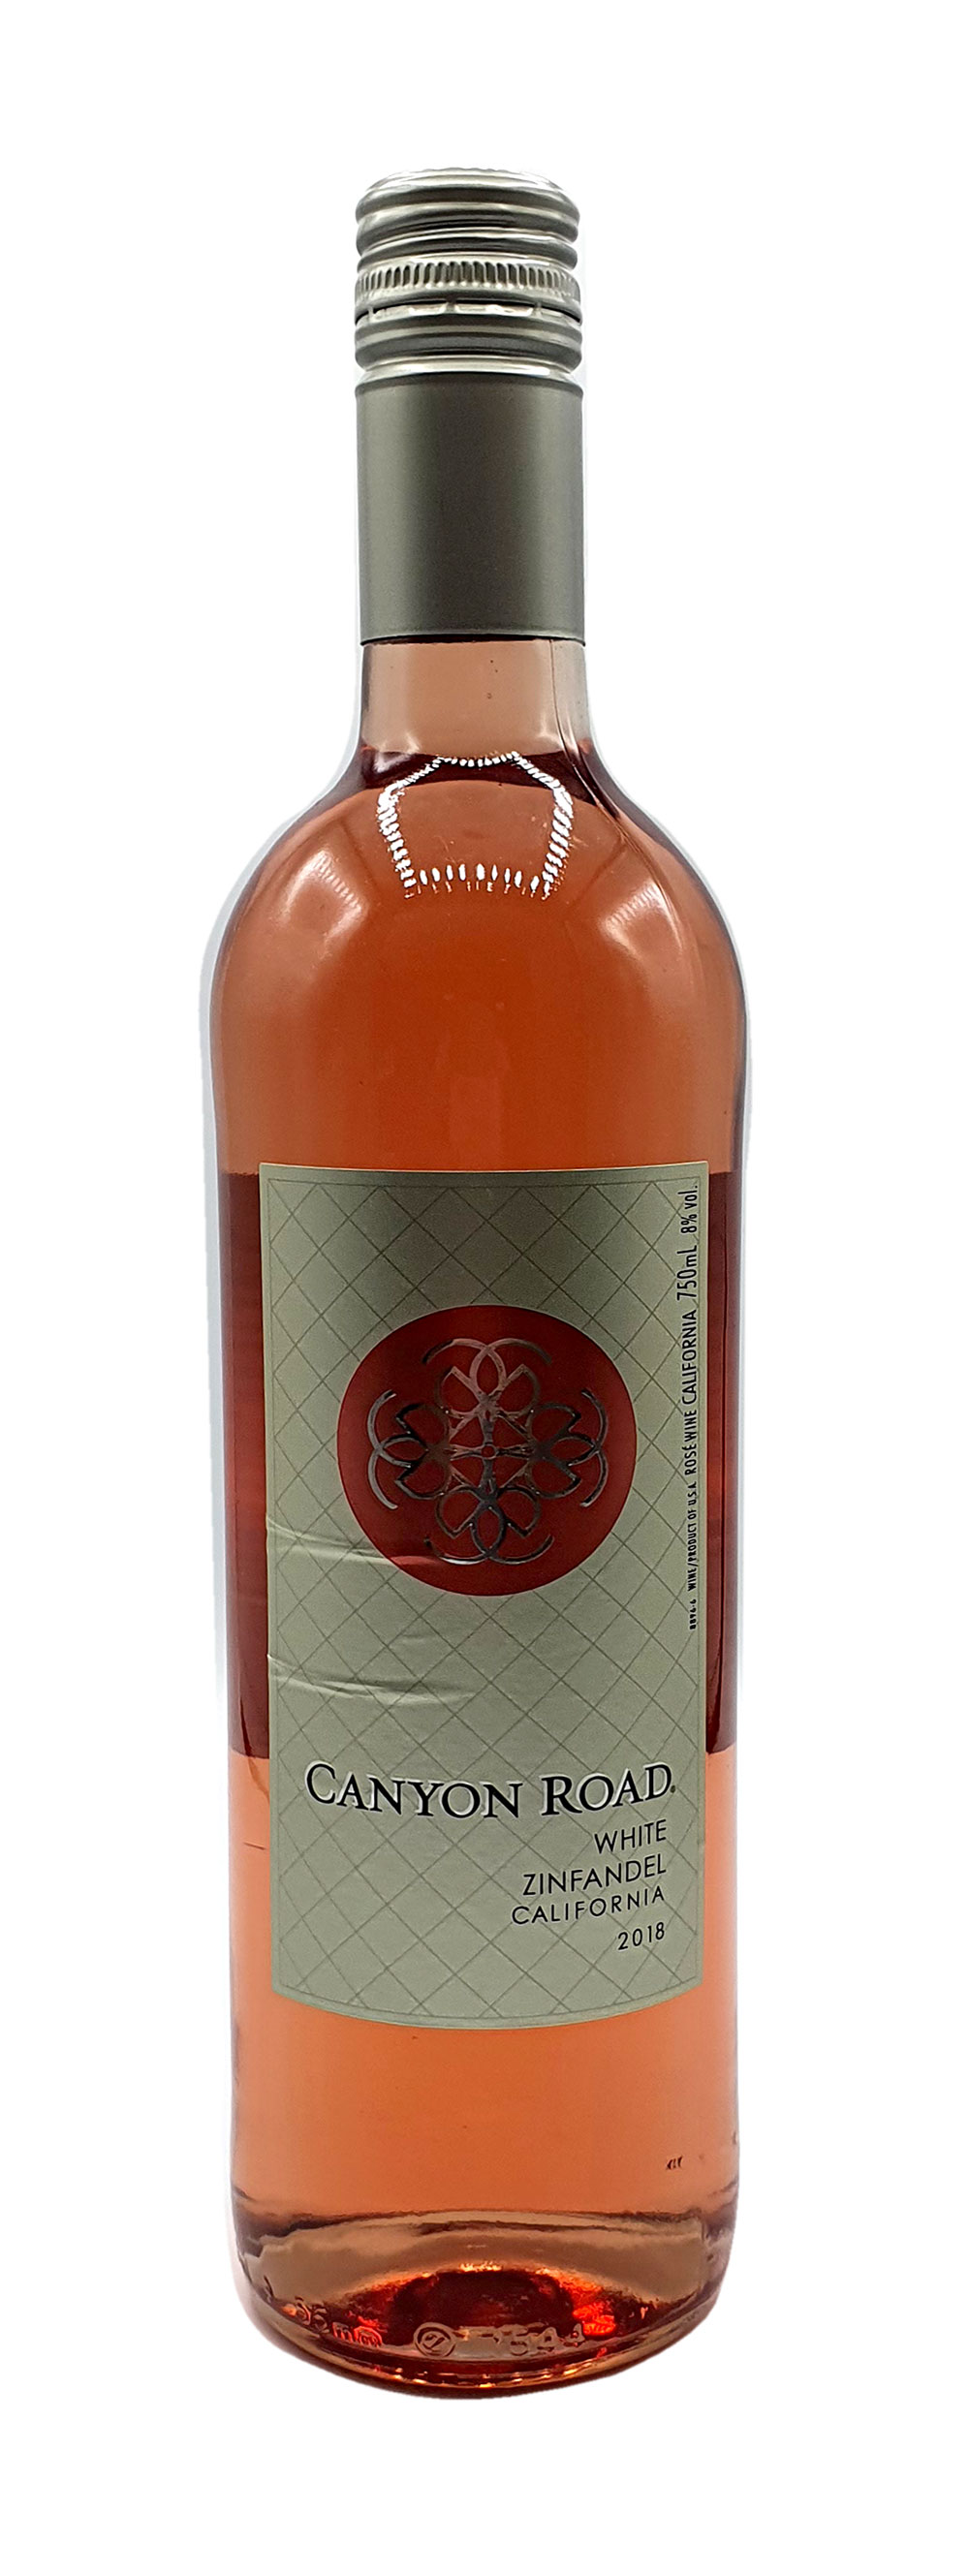 Rose Wein - Canyon Road Zinfandel 750ml (8% Vol)- [Enthält Sulfite]